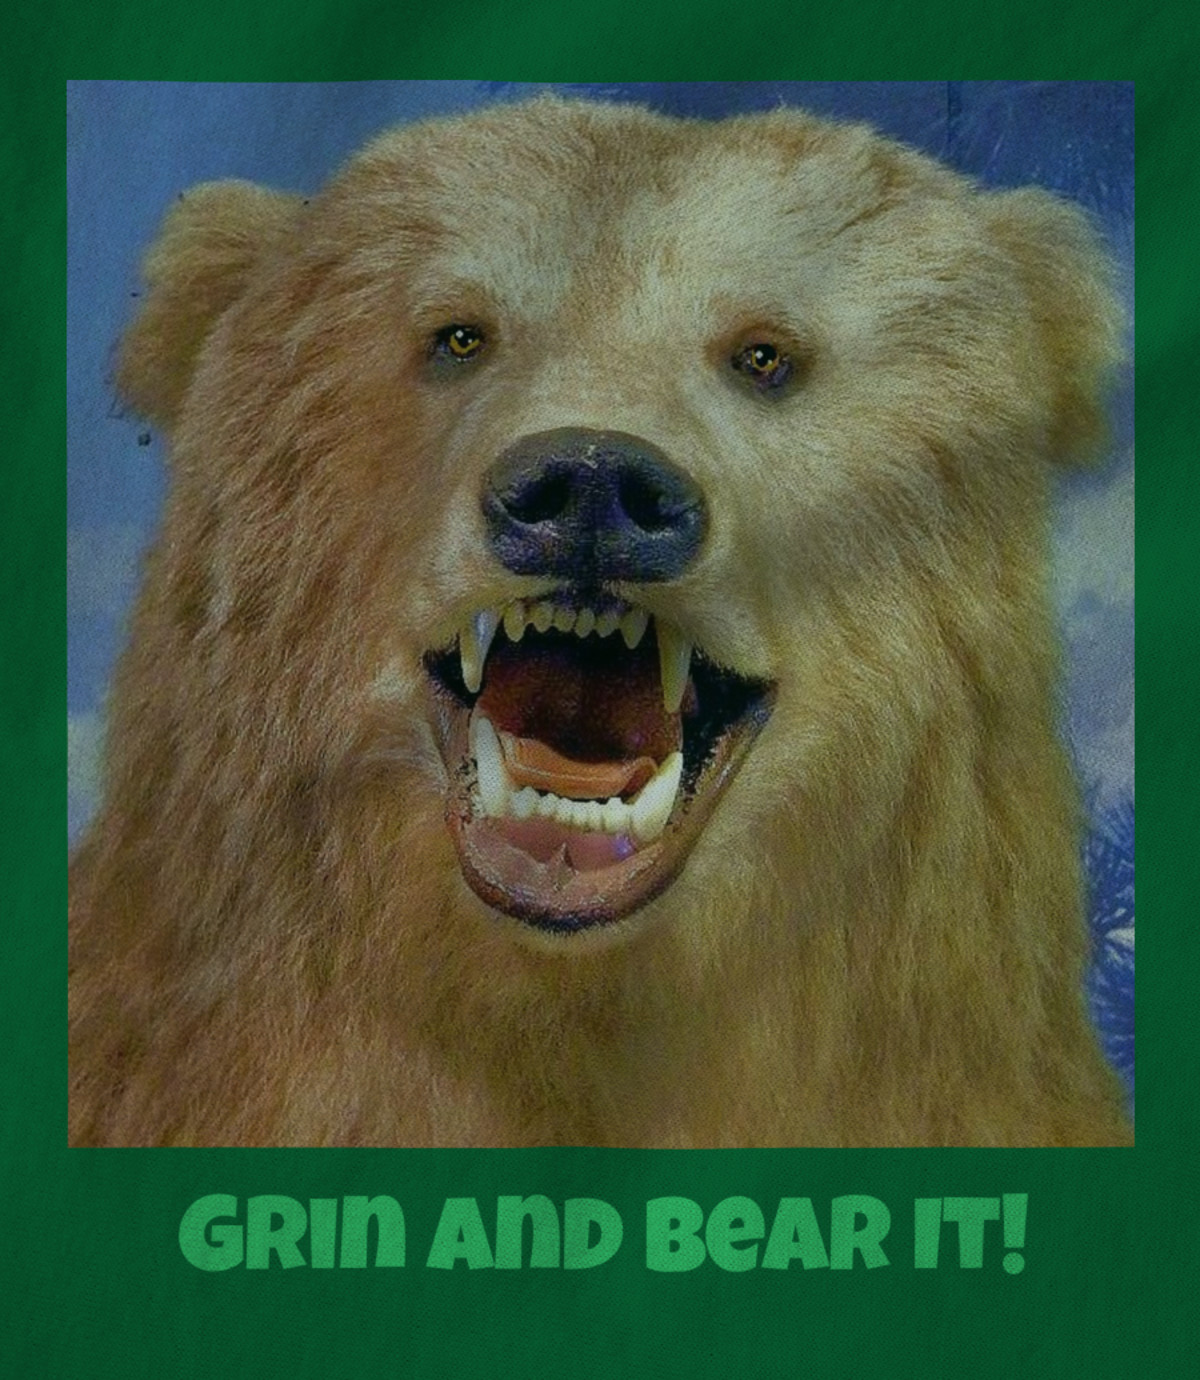 Matthew f  blowers iii   2017 grin and bear it   1506455789